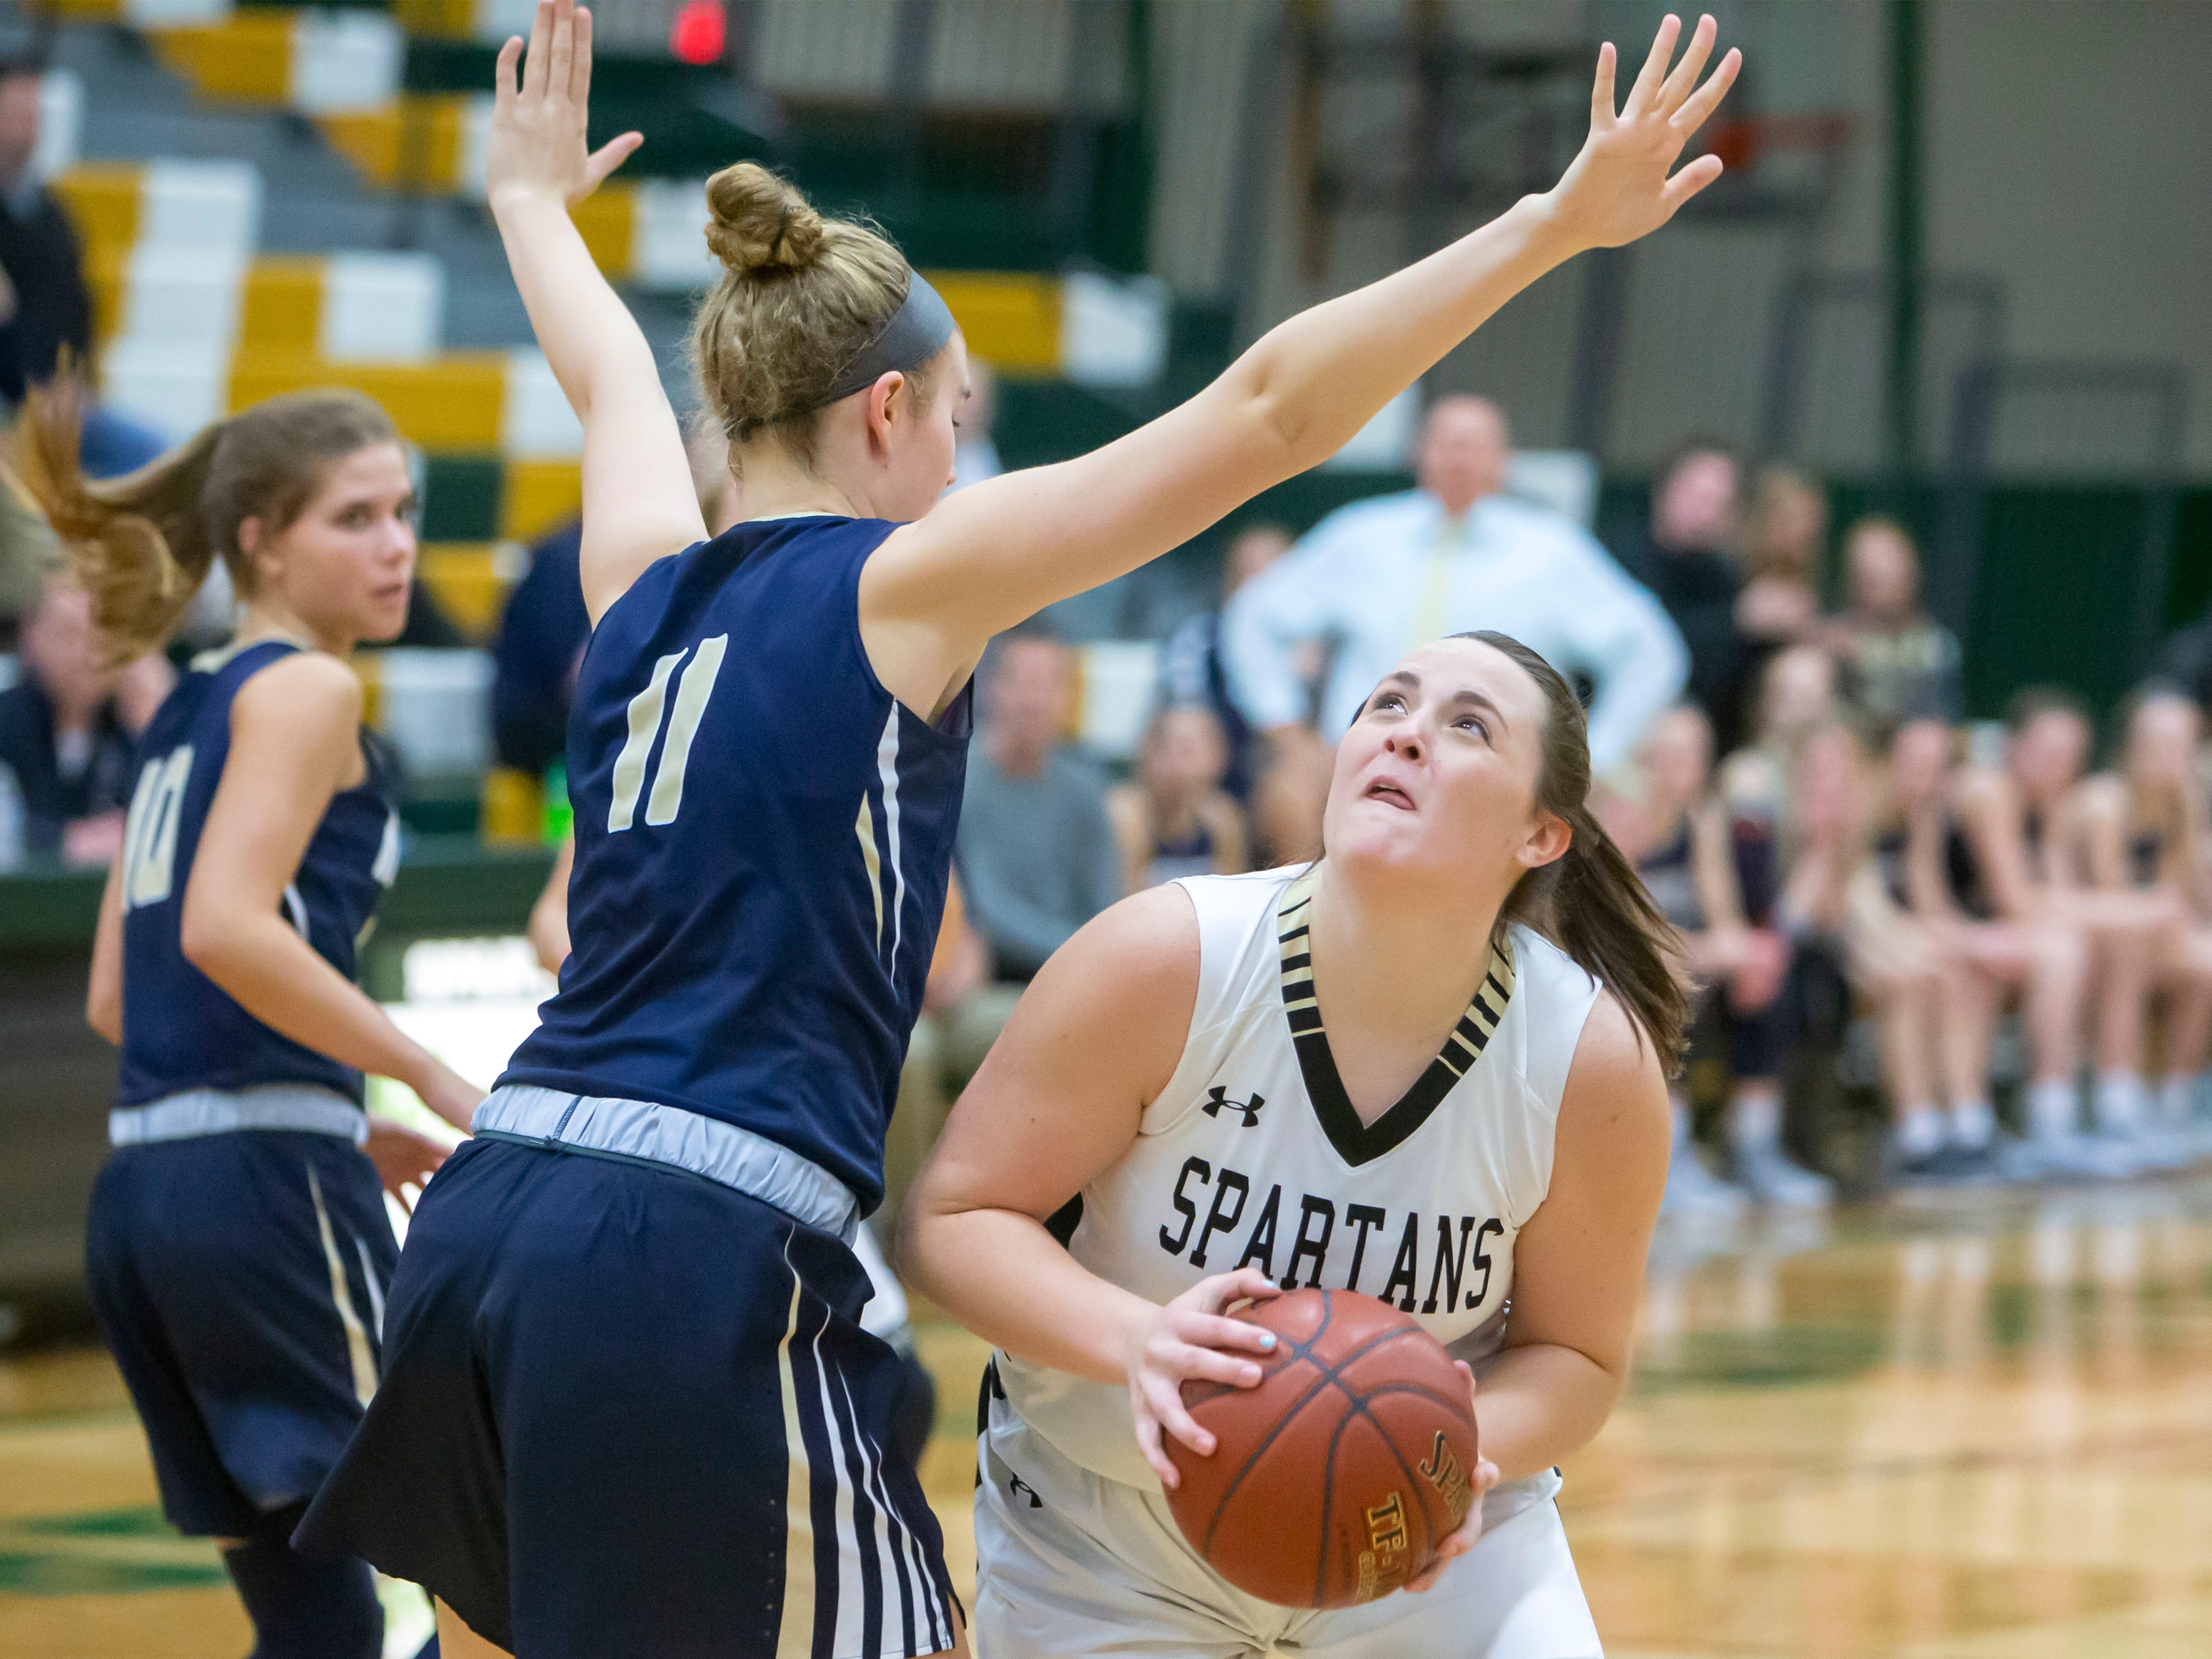 Oshkosh North's Brie Gauthier looks to shoot around Appleton North's Emma Erickson at the girls basketball game Friday, February 8, 2019, in Oshkosh, Wis., at Oshkosh North High School.